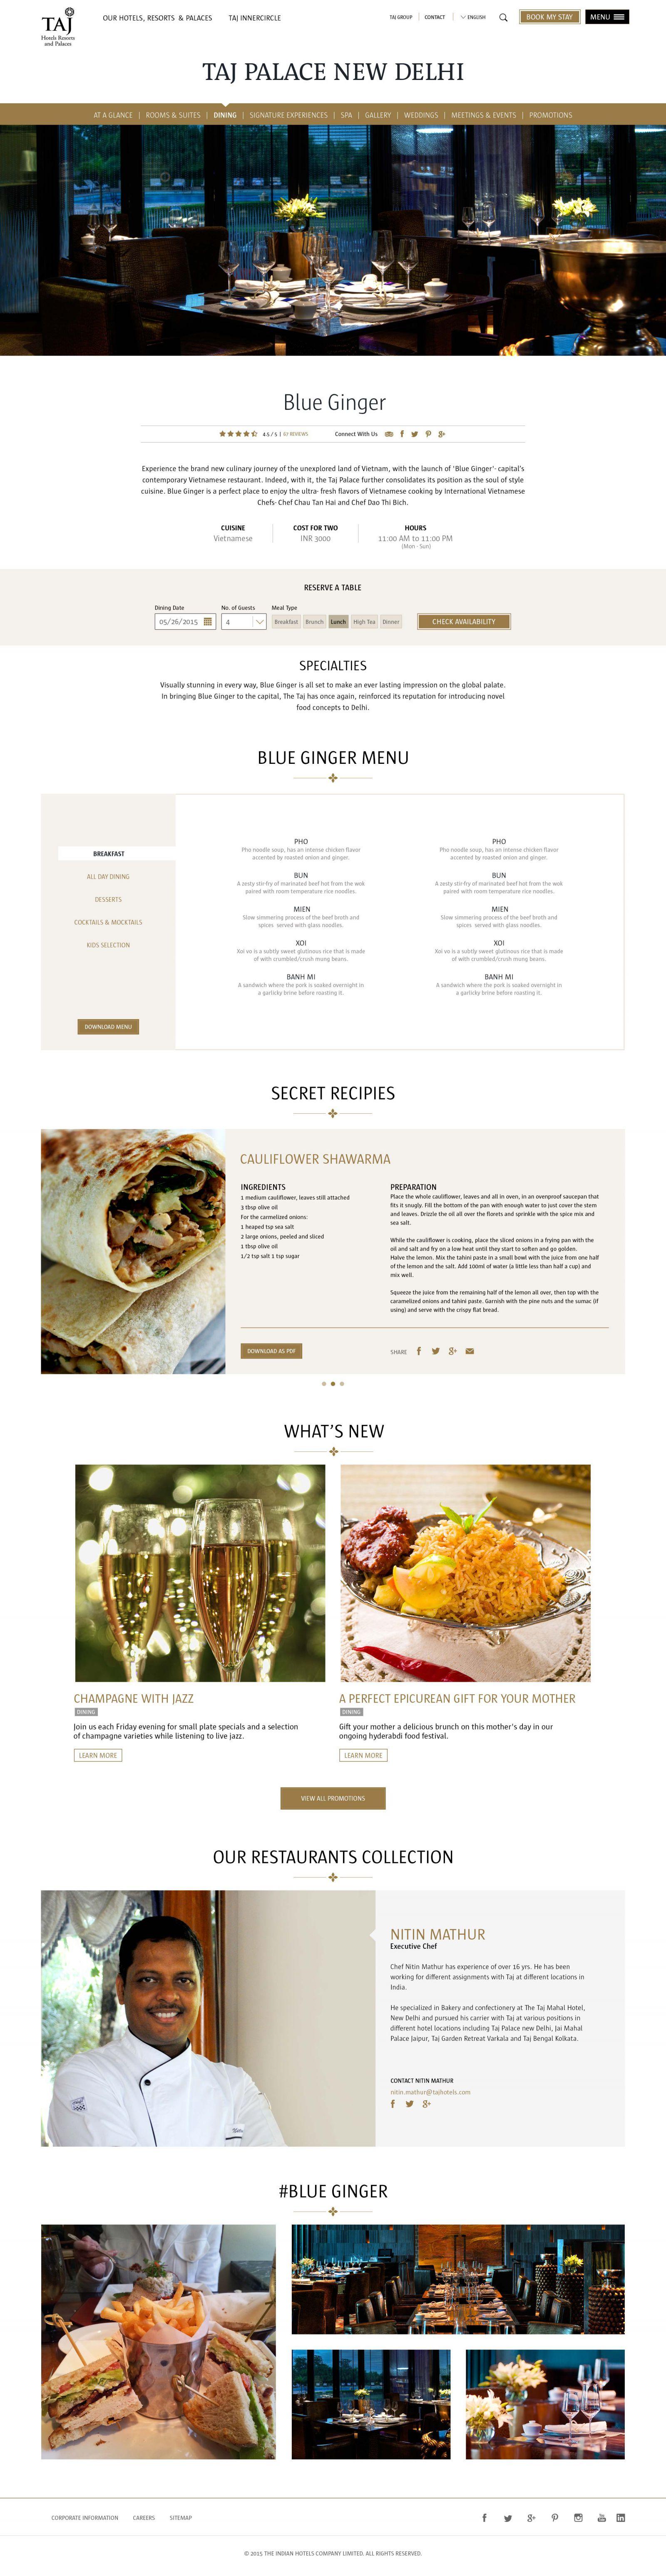 Restaurant detail page